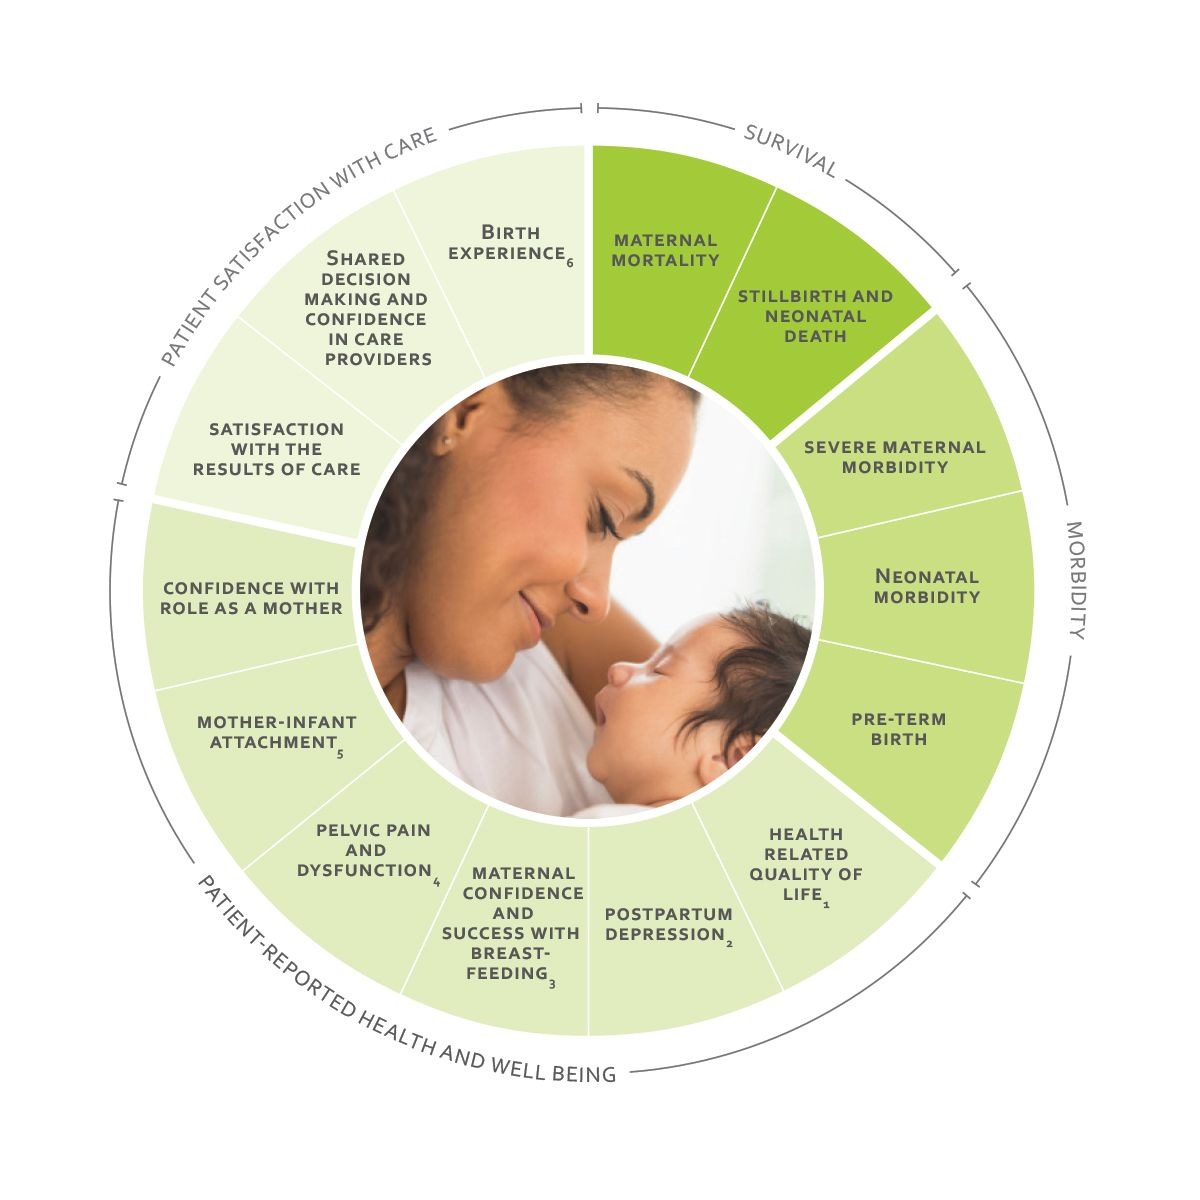 Pin on Pregnancy, Childbirth & Newborn Care